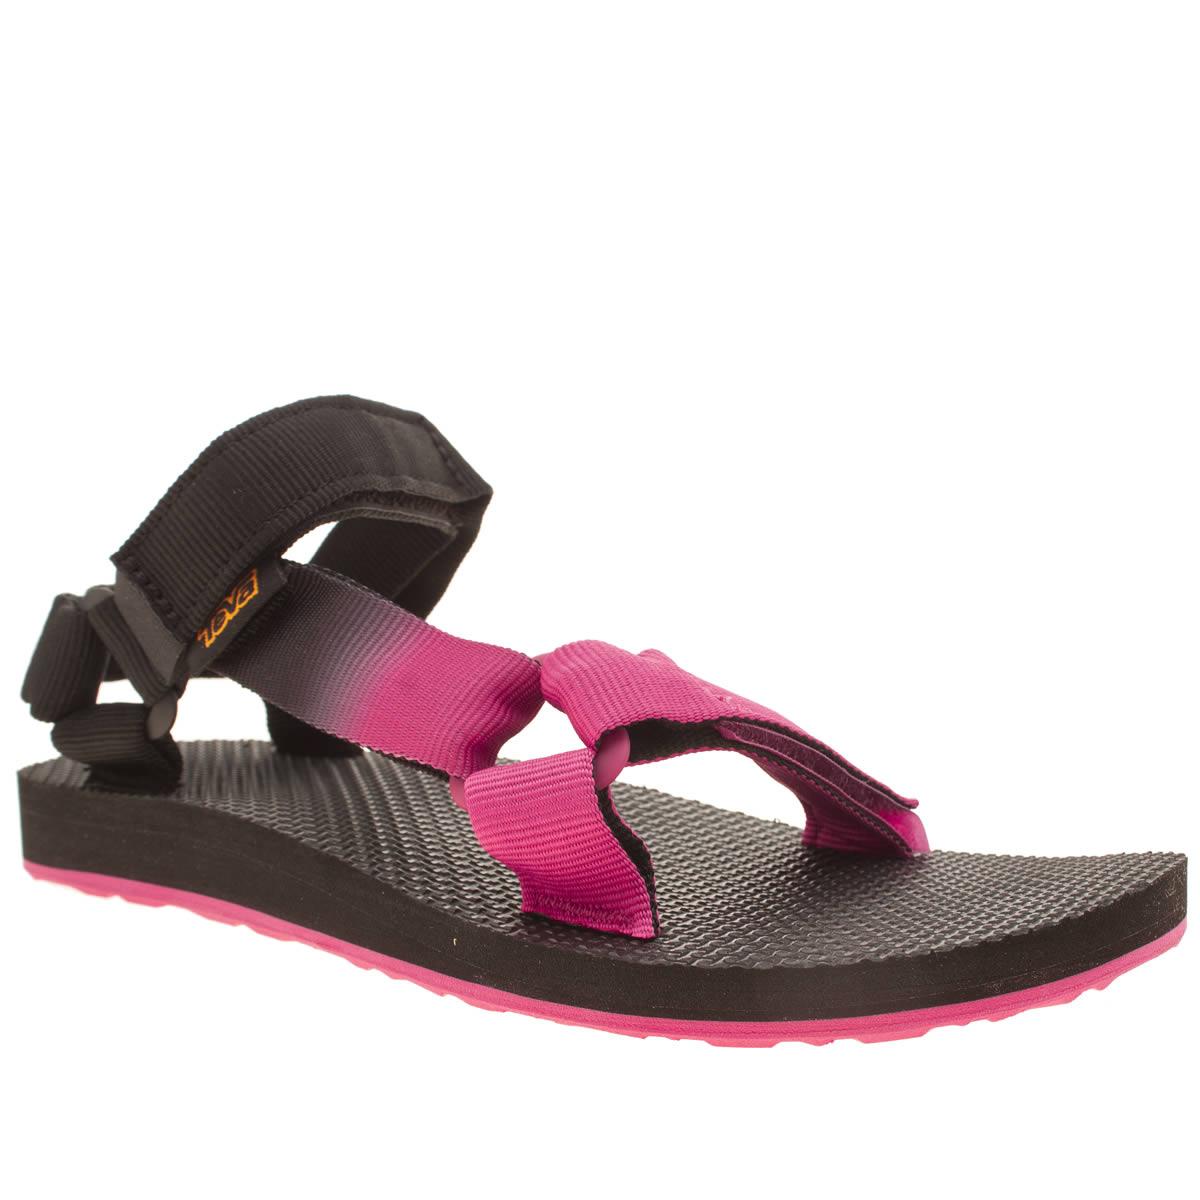 Teva Teva Black & Pink Universal Gradient Sandals